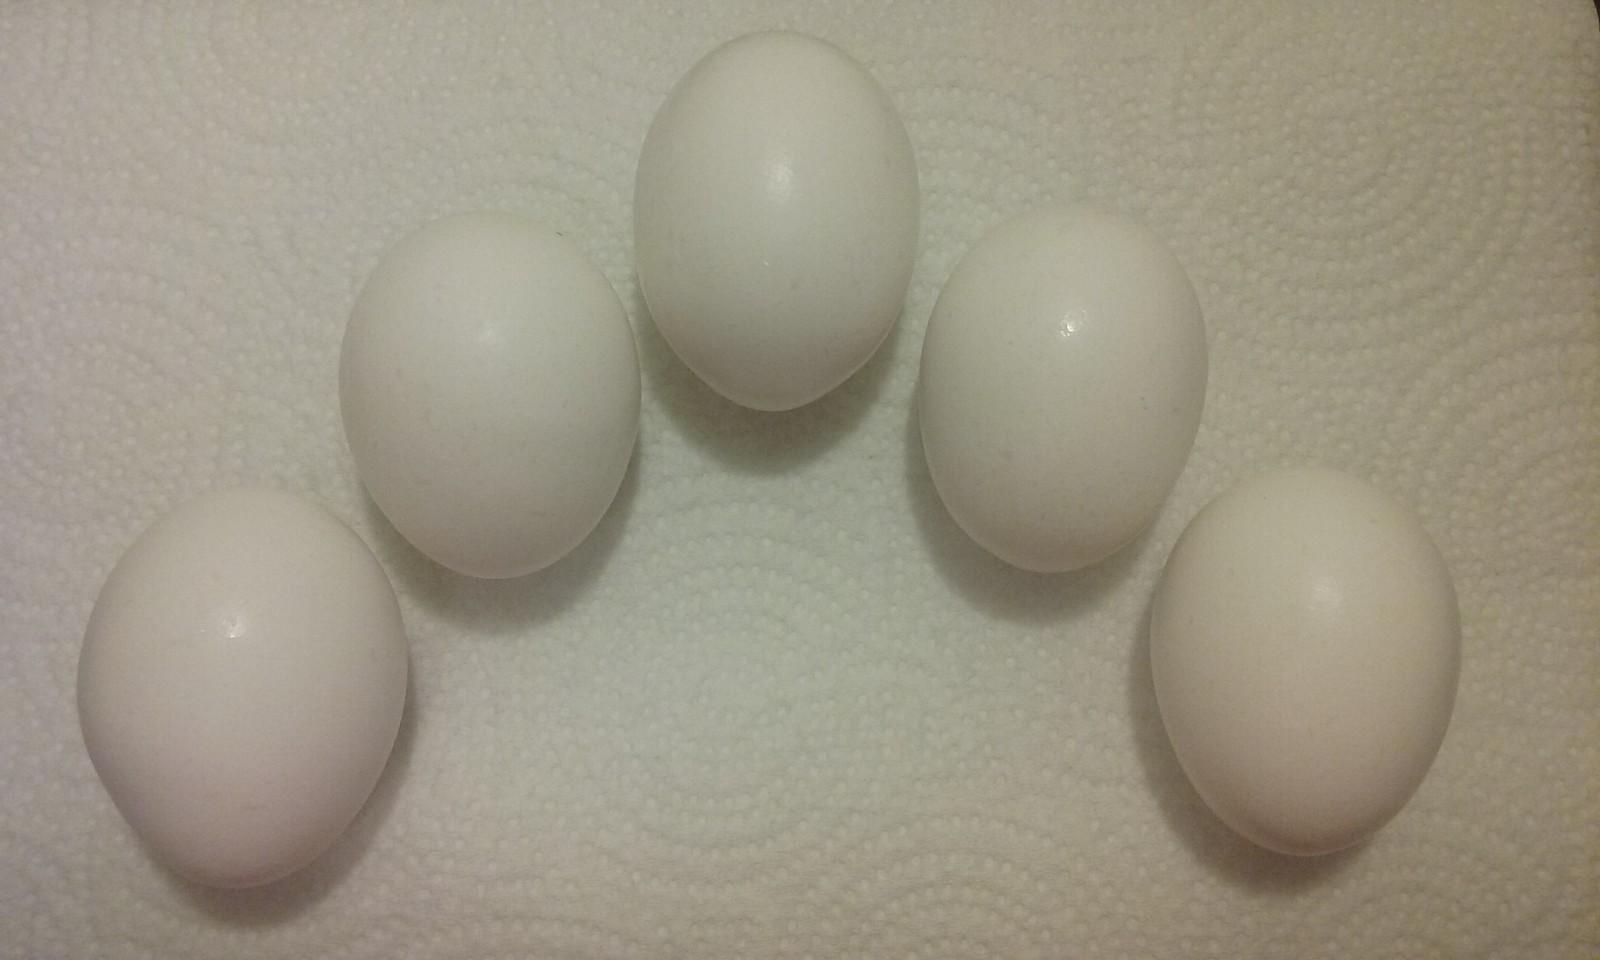 Calm feeling with eggs